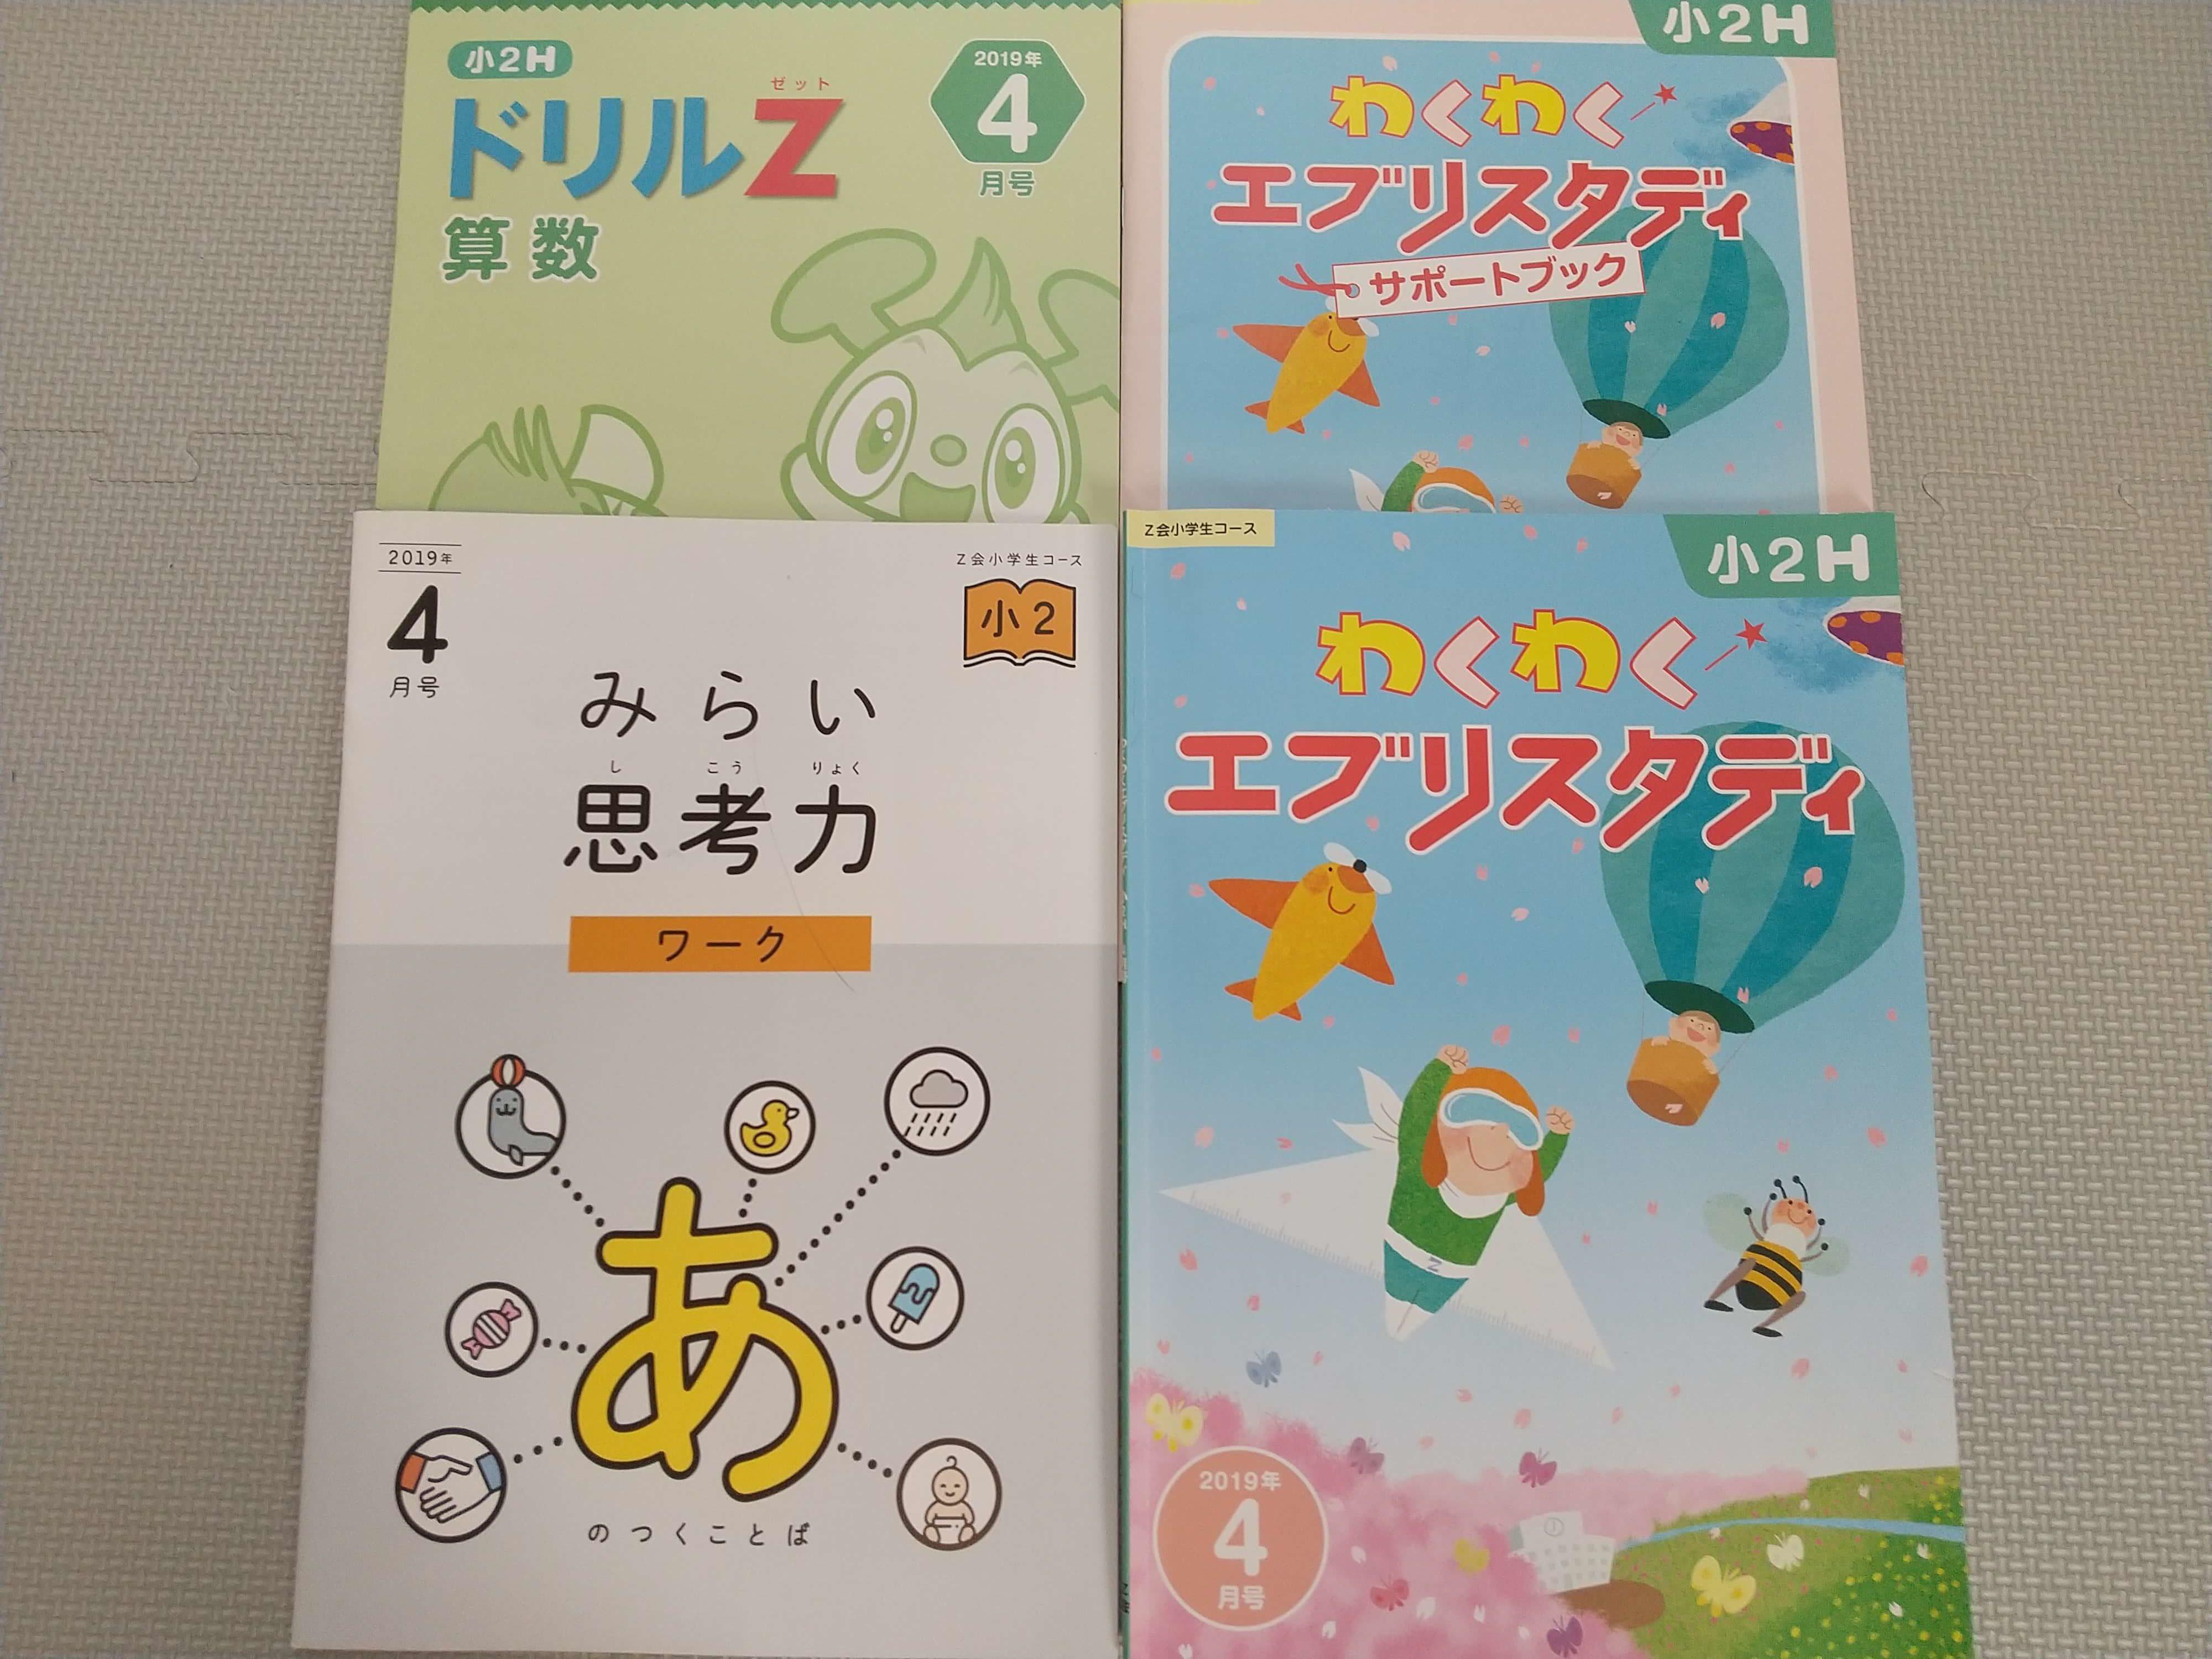 Z会小学生コース2年生の使用テキスト